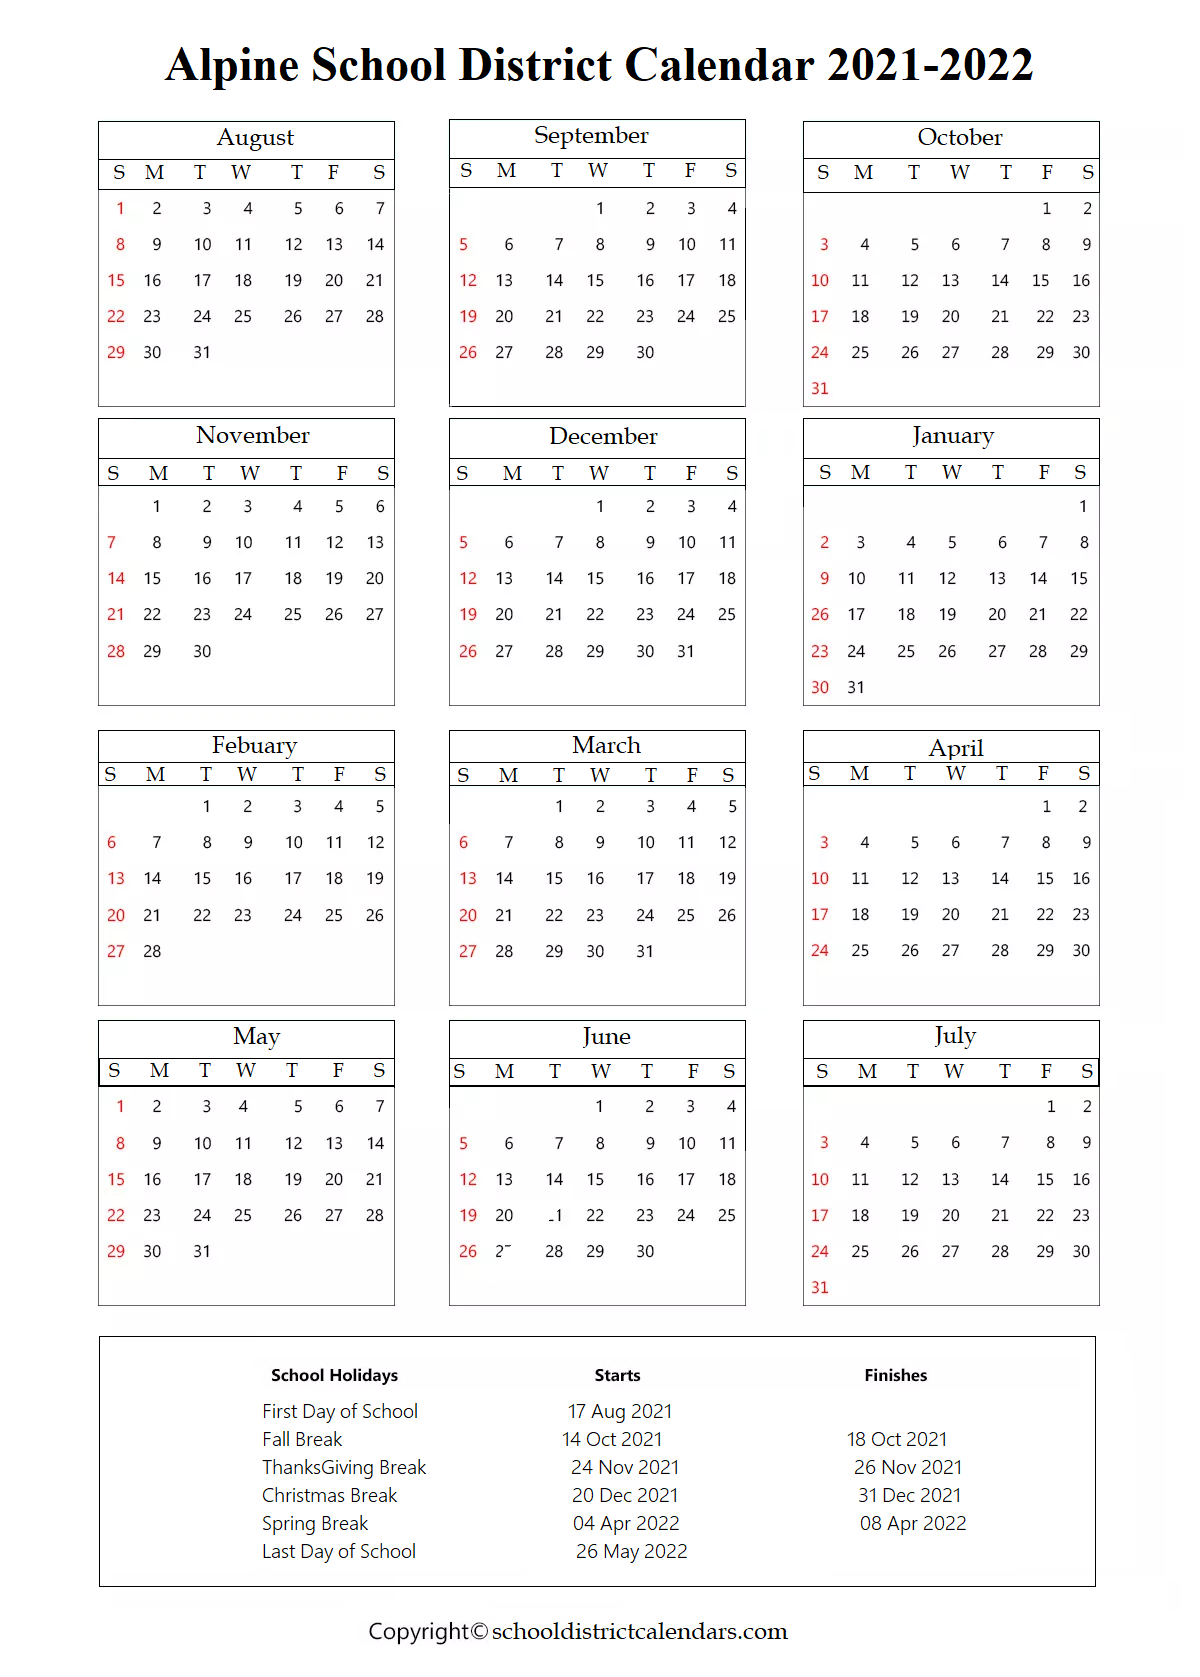 Alpine School District Calendar Holidays 2021-22